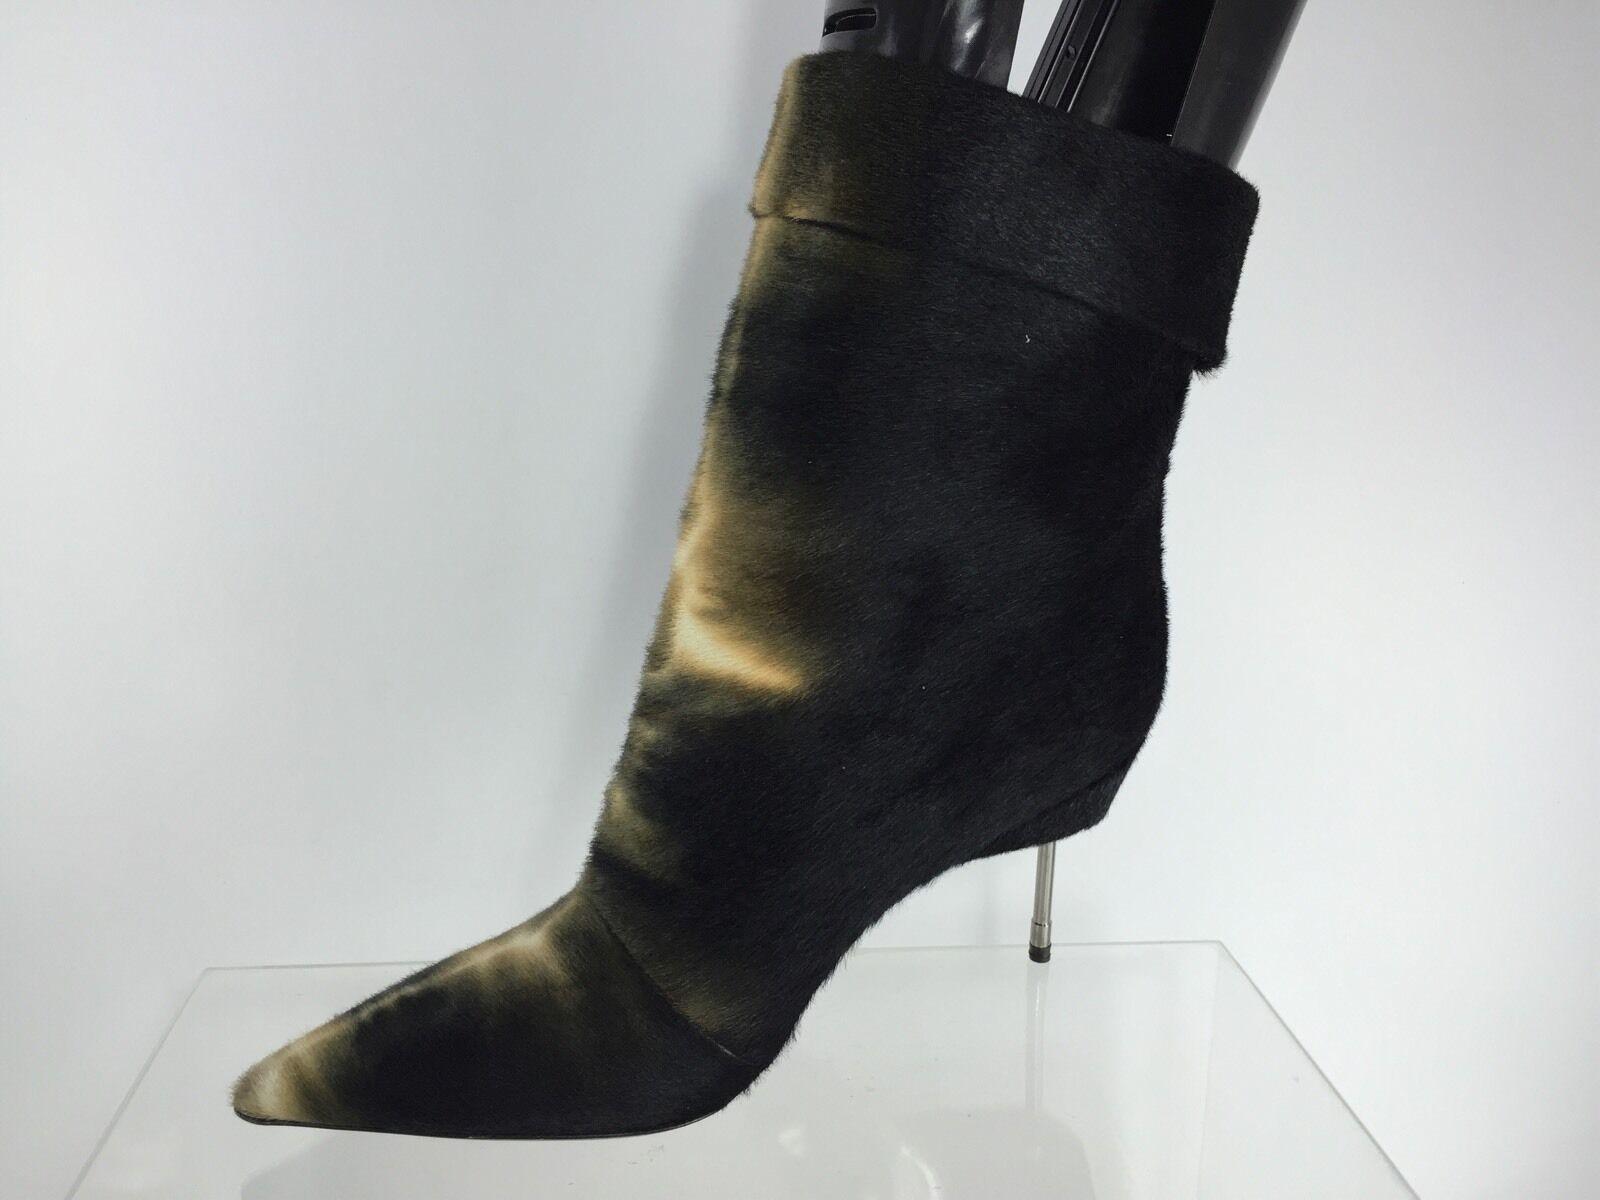 974 KURT GEIGER LONDON Paddington PONYSKIN Femme Noir Multi Couleur bottes 40